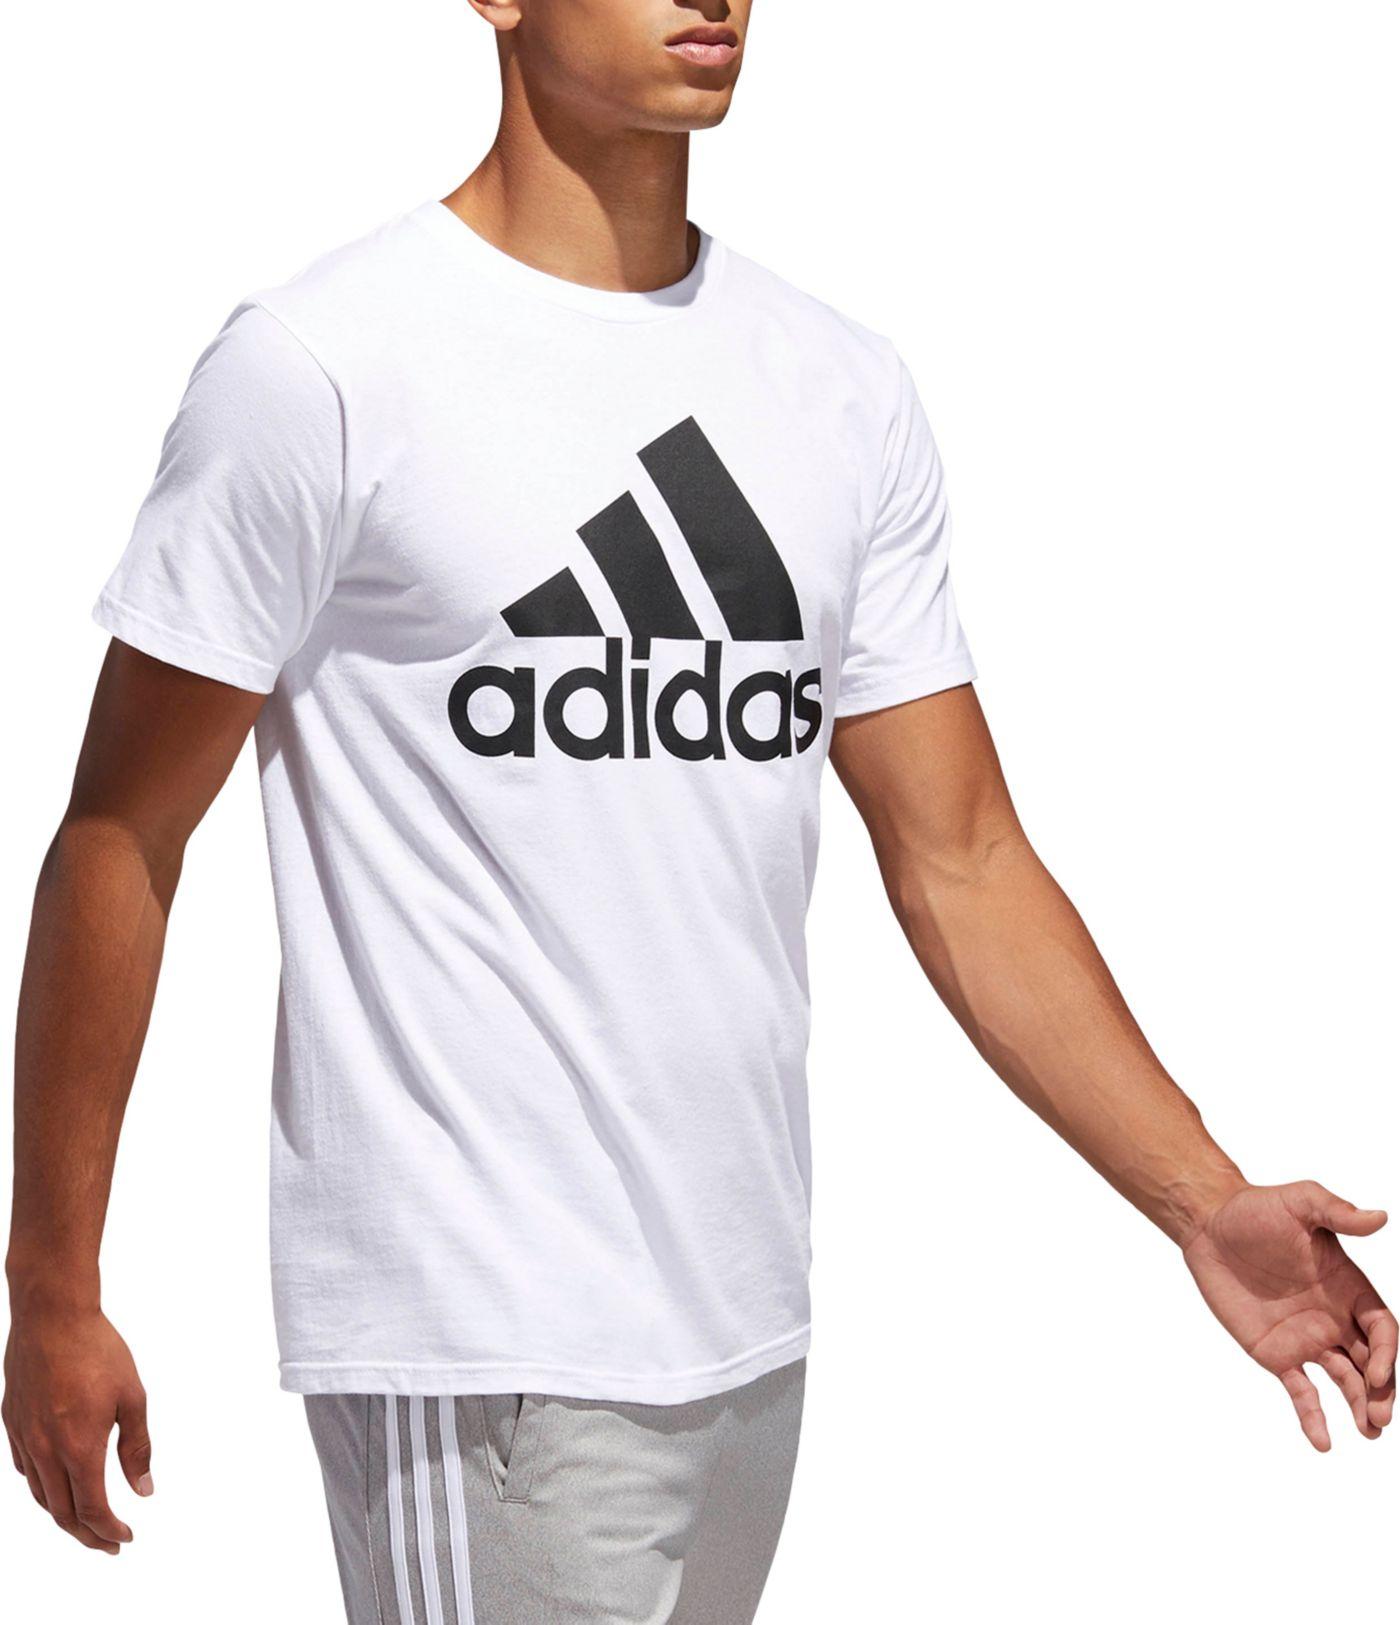 adidas Men's Athletics Badge Of Sport Graphic T-Shirt